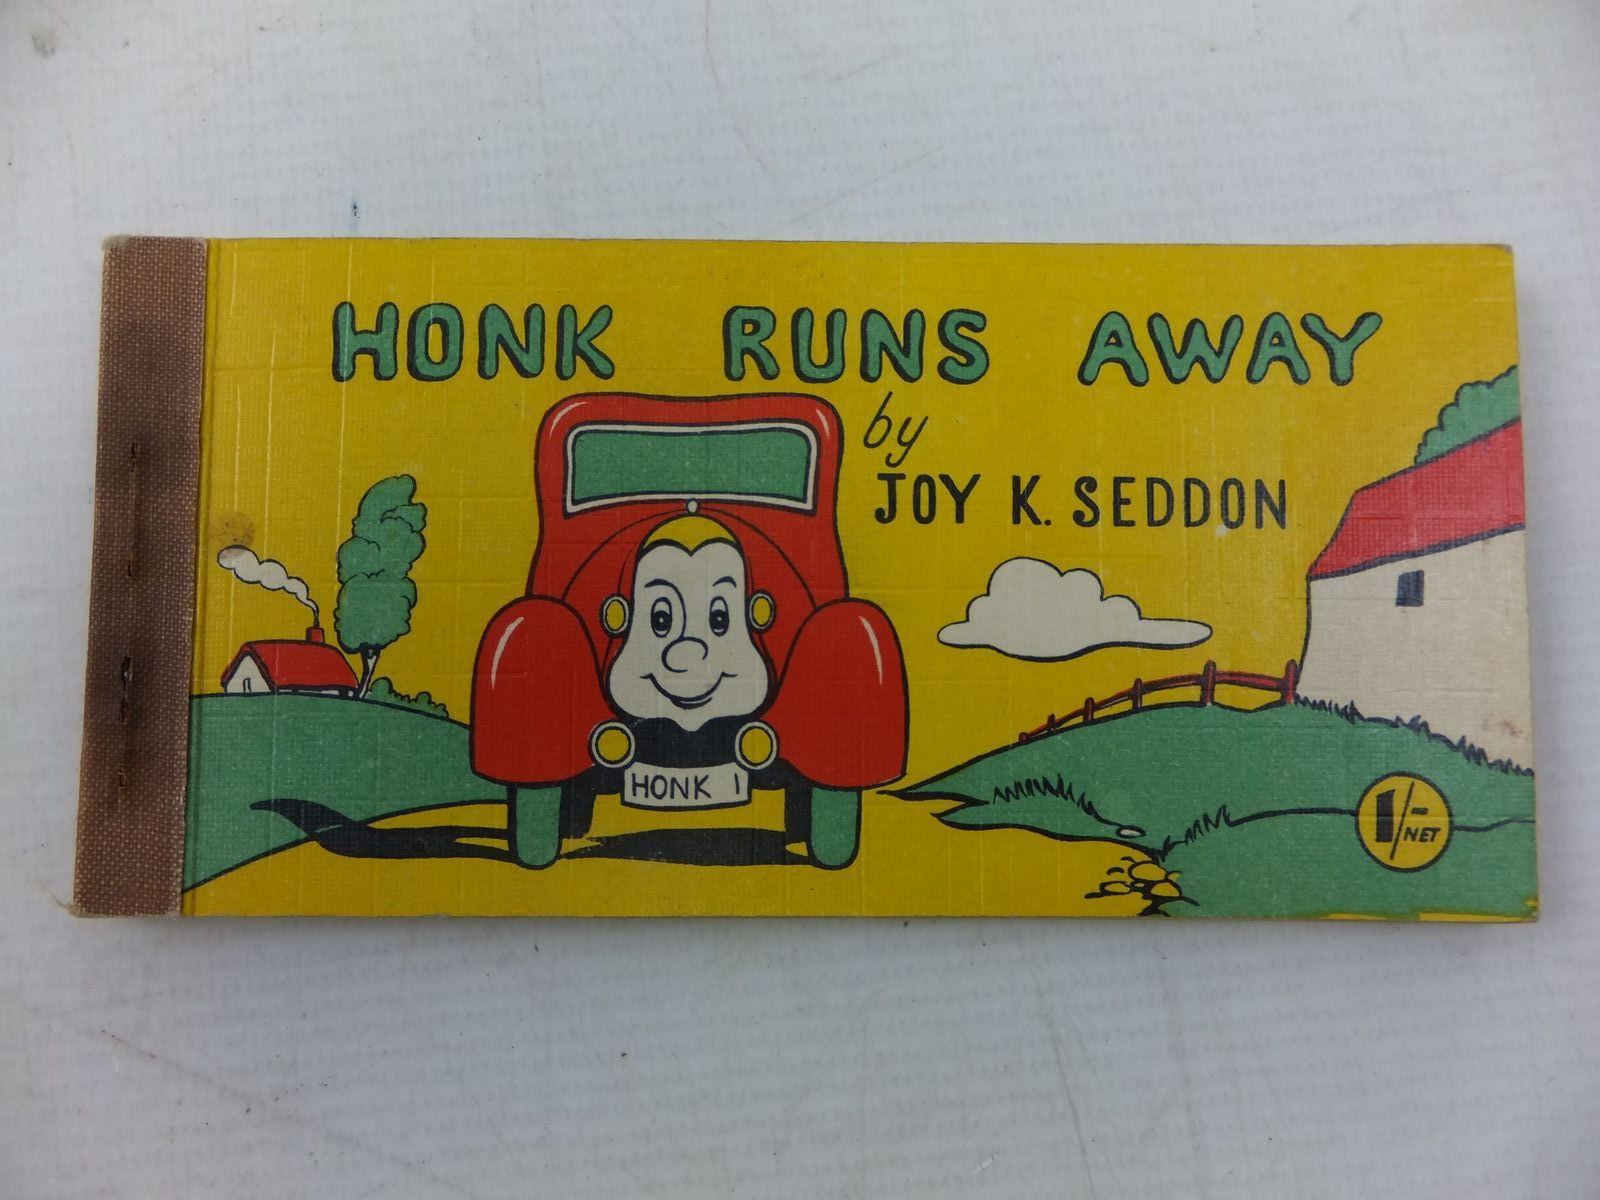 Photo of HONK RUNS AWAY written by Seddon, Joy K. published by Brockhampton Press Ltd. (STOCK CODE: 2114327)  for sale by Stella & Rose's Books